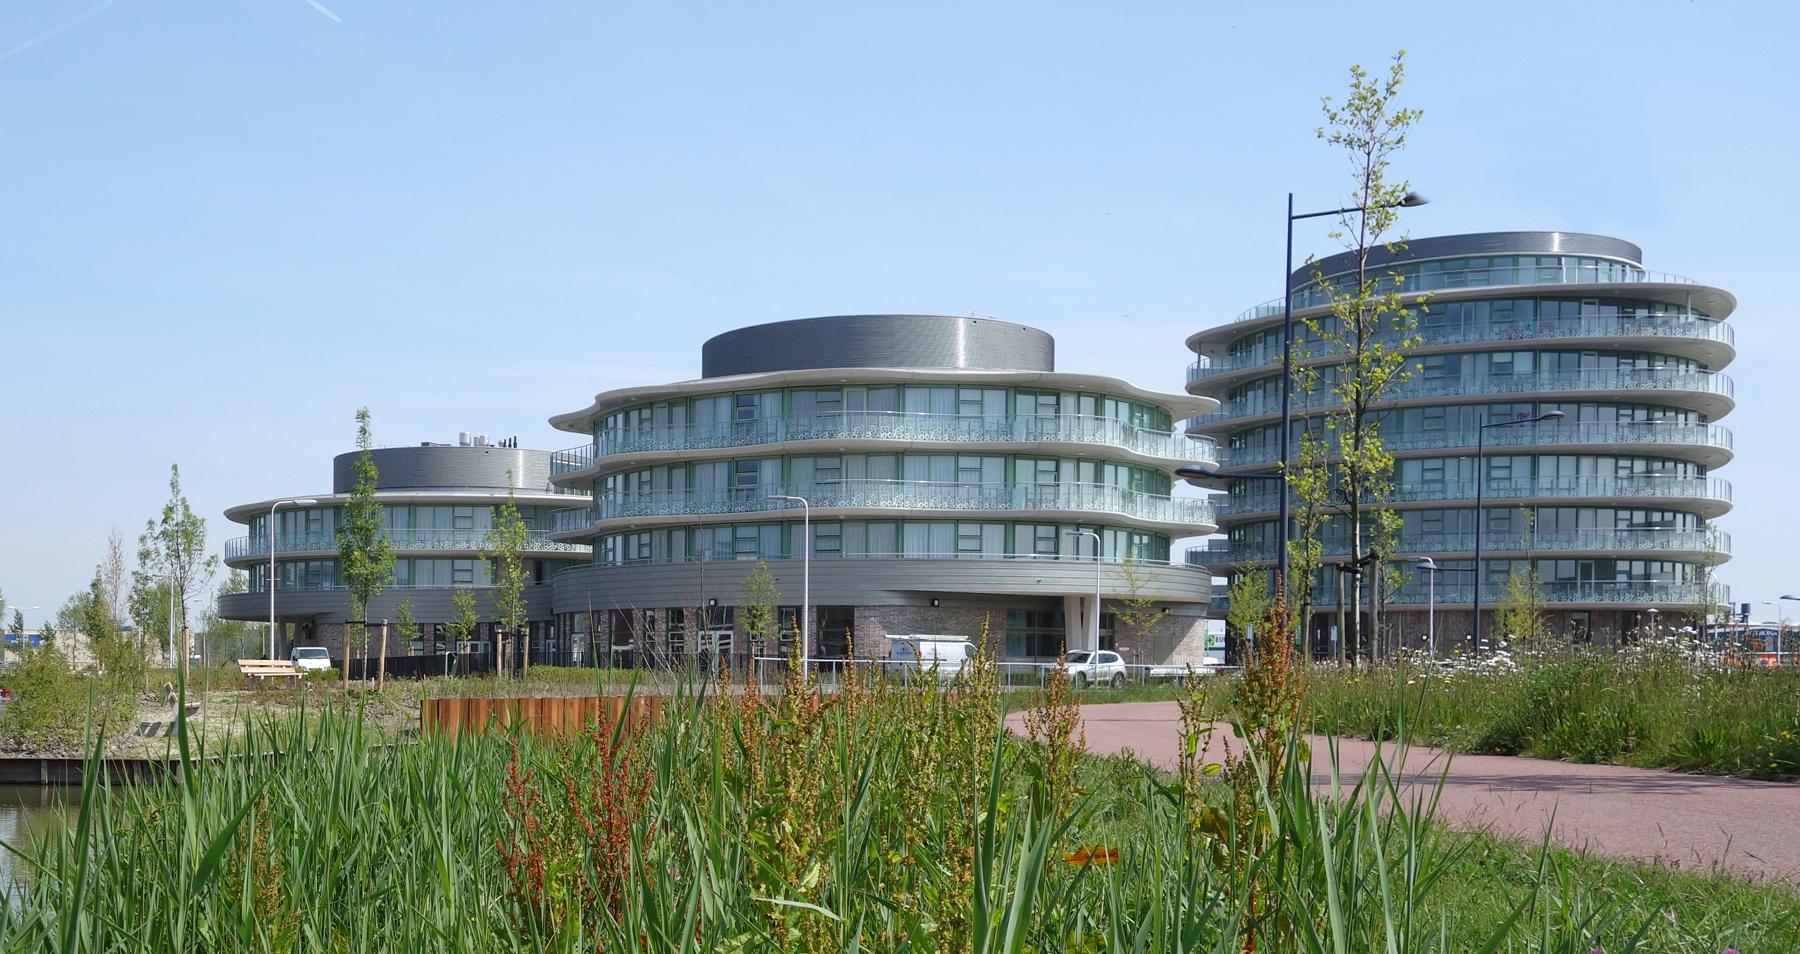 zorg-vastgoed-woonzorgcomplex-woerdblokeiland